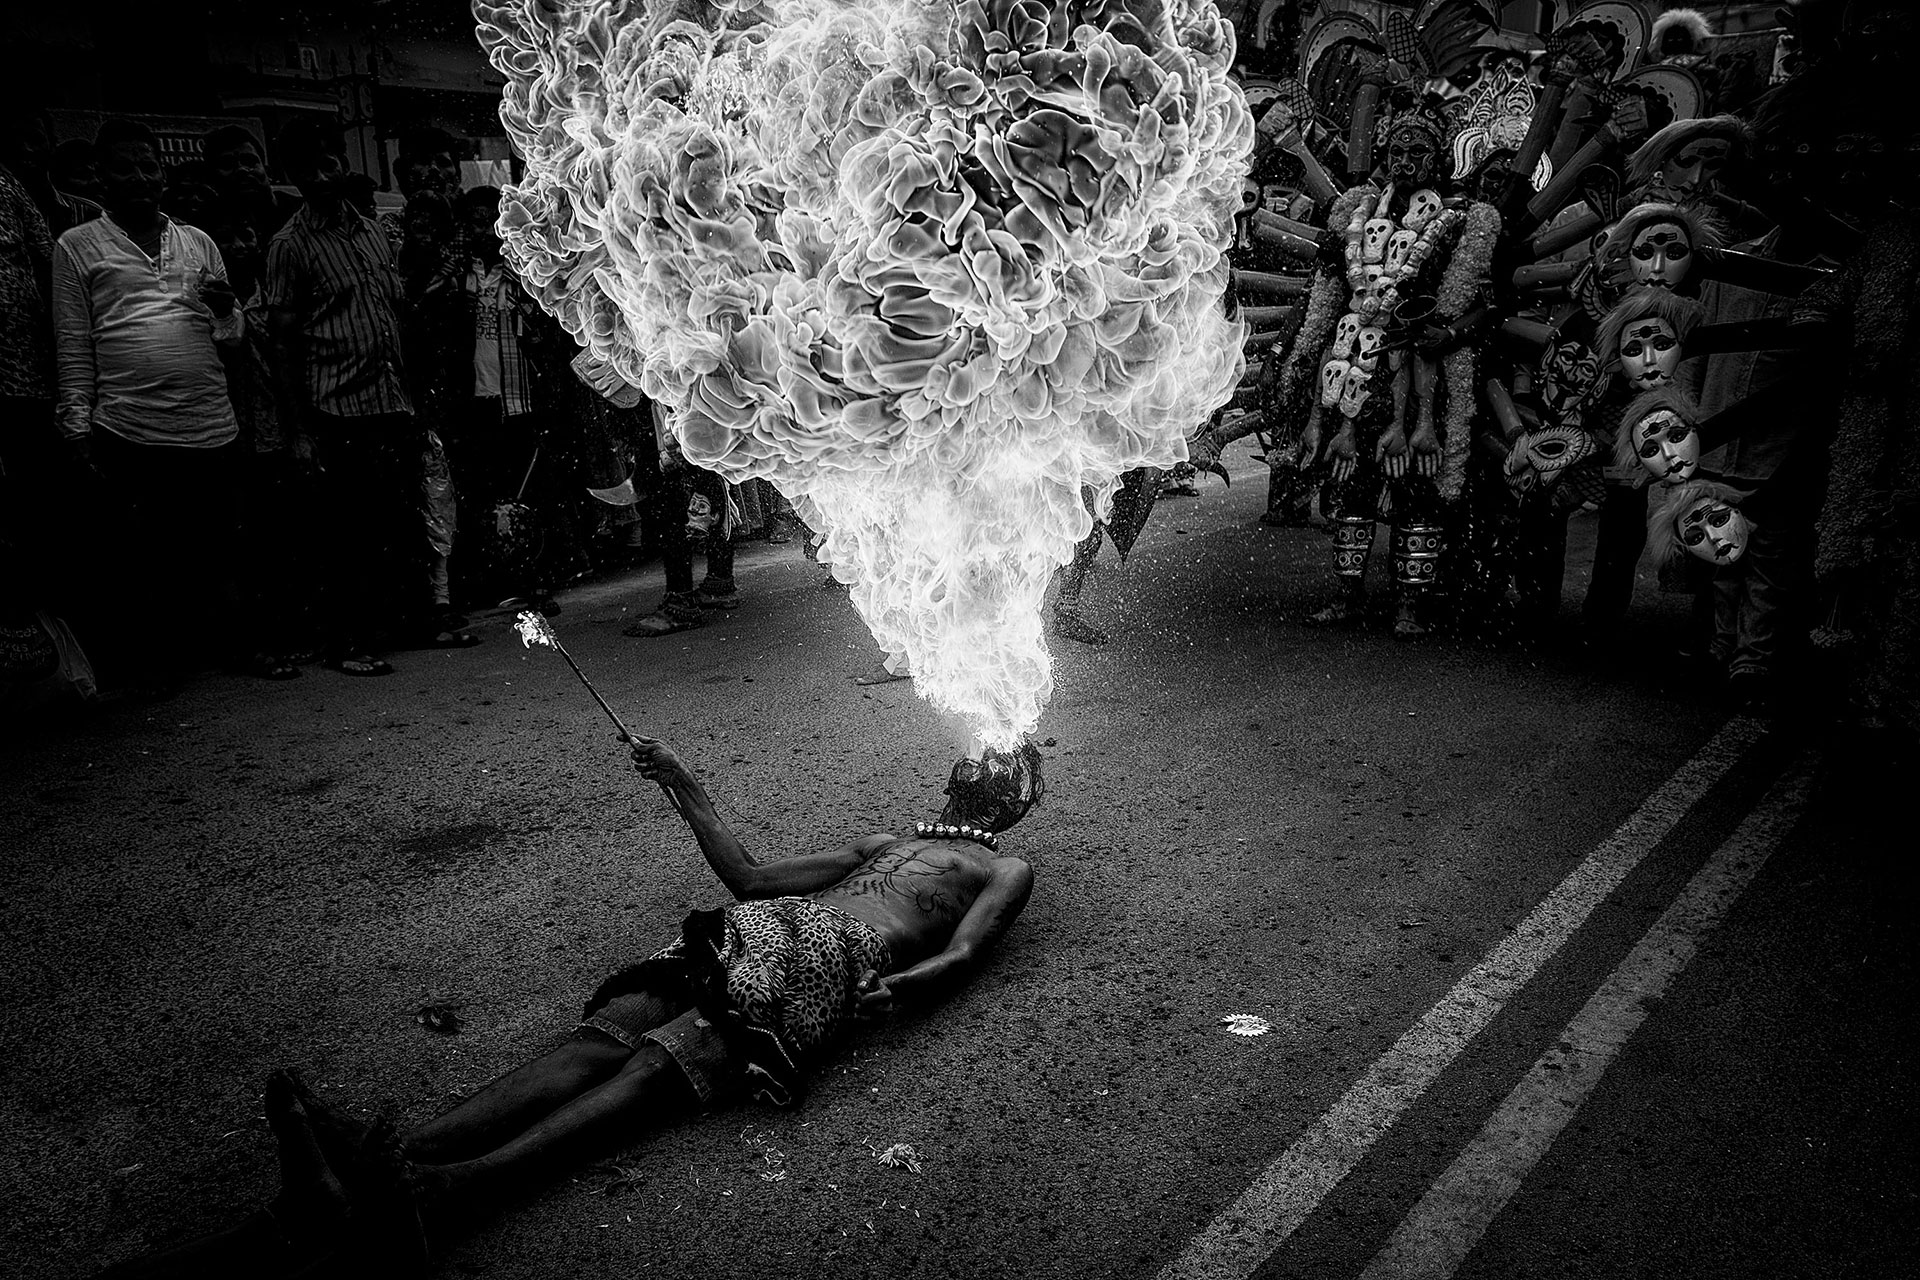 Fot. Joydeep Mukherjee, Indie, National Awards, 1. miejsce, 2019 Sony World Photography Awards